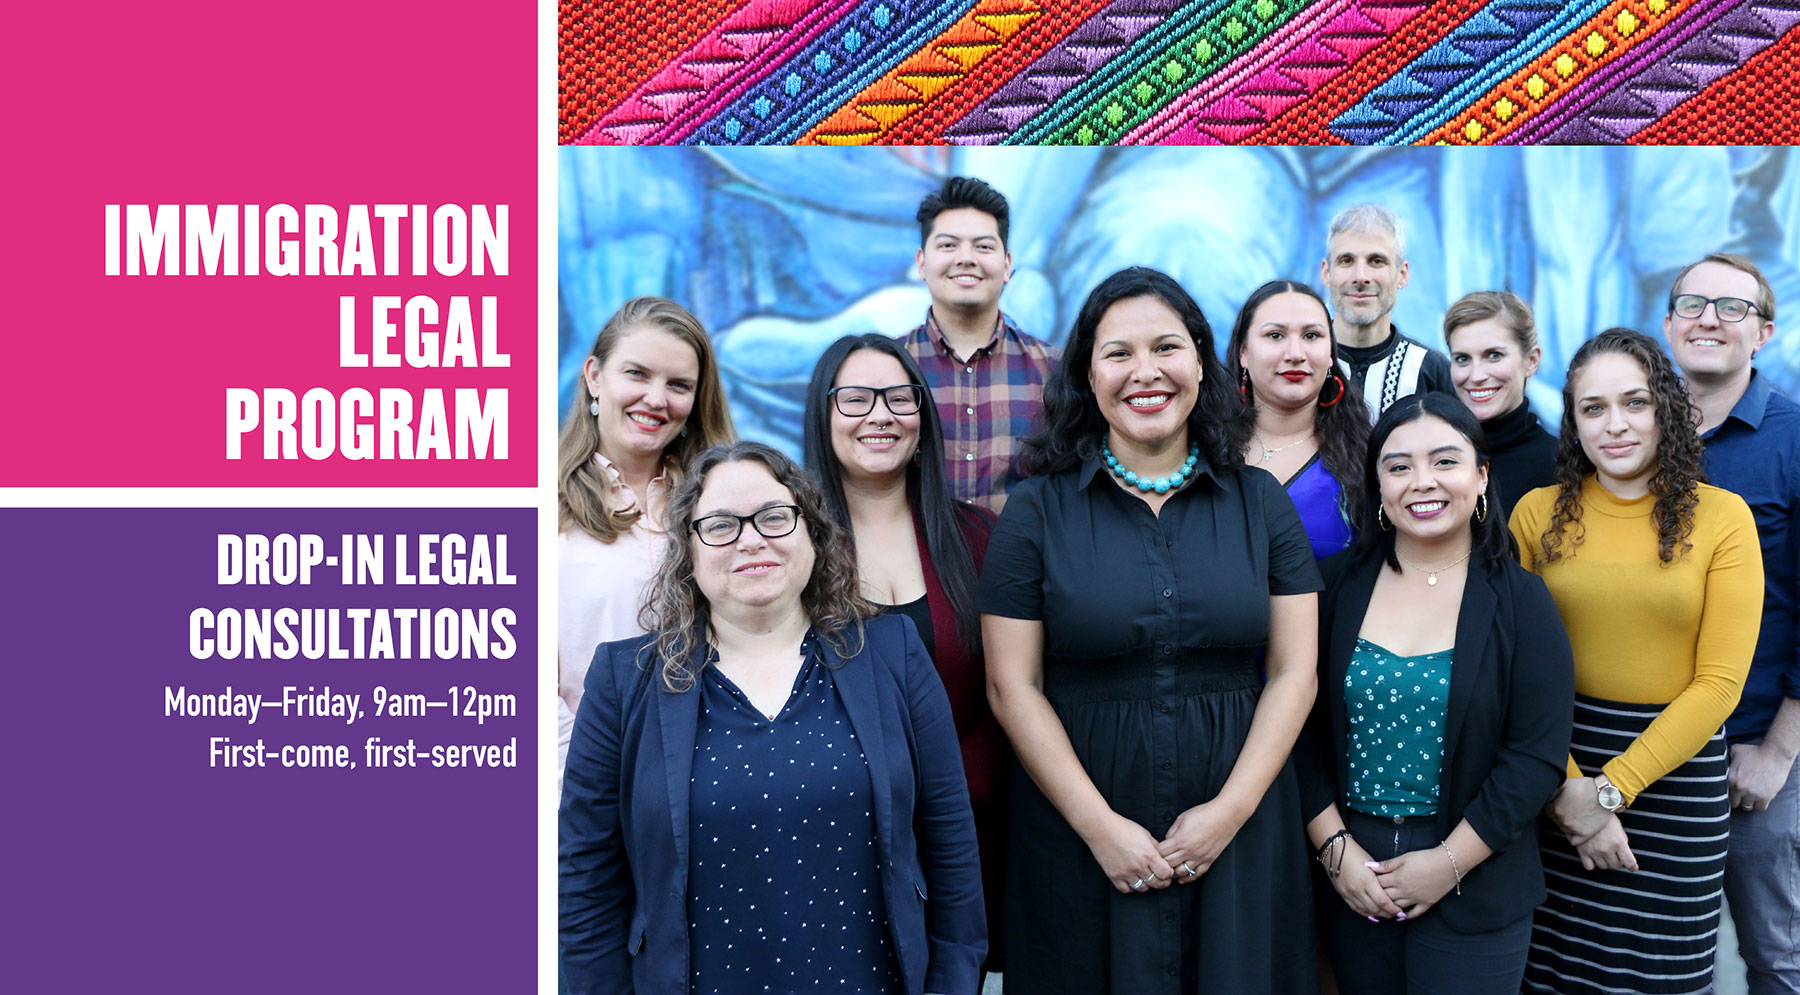 Immigration Legal Program